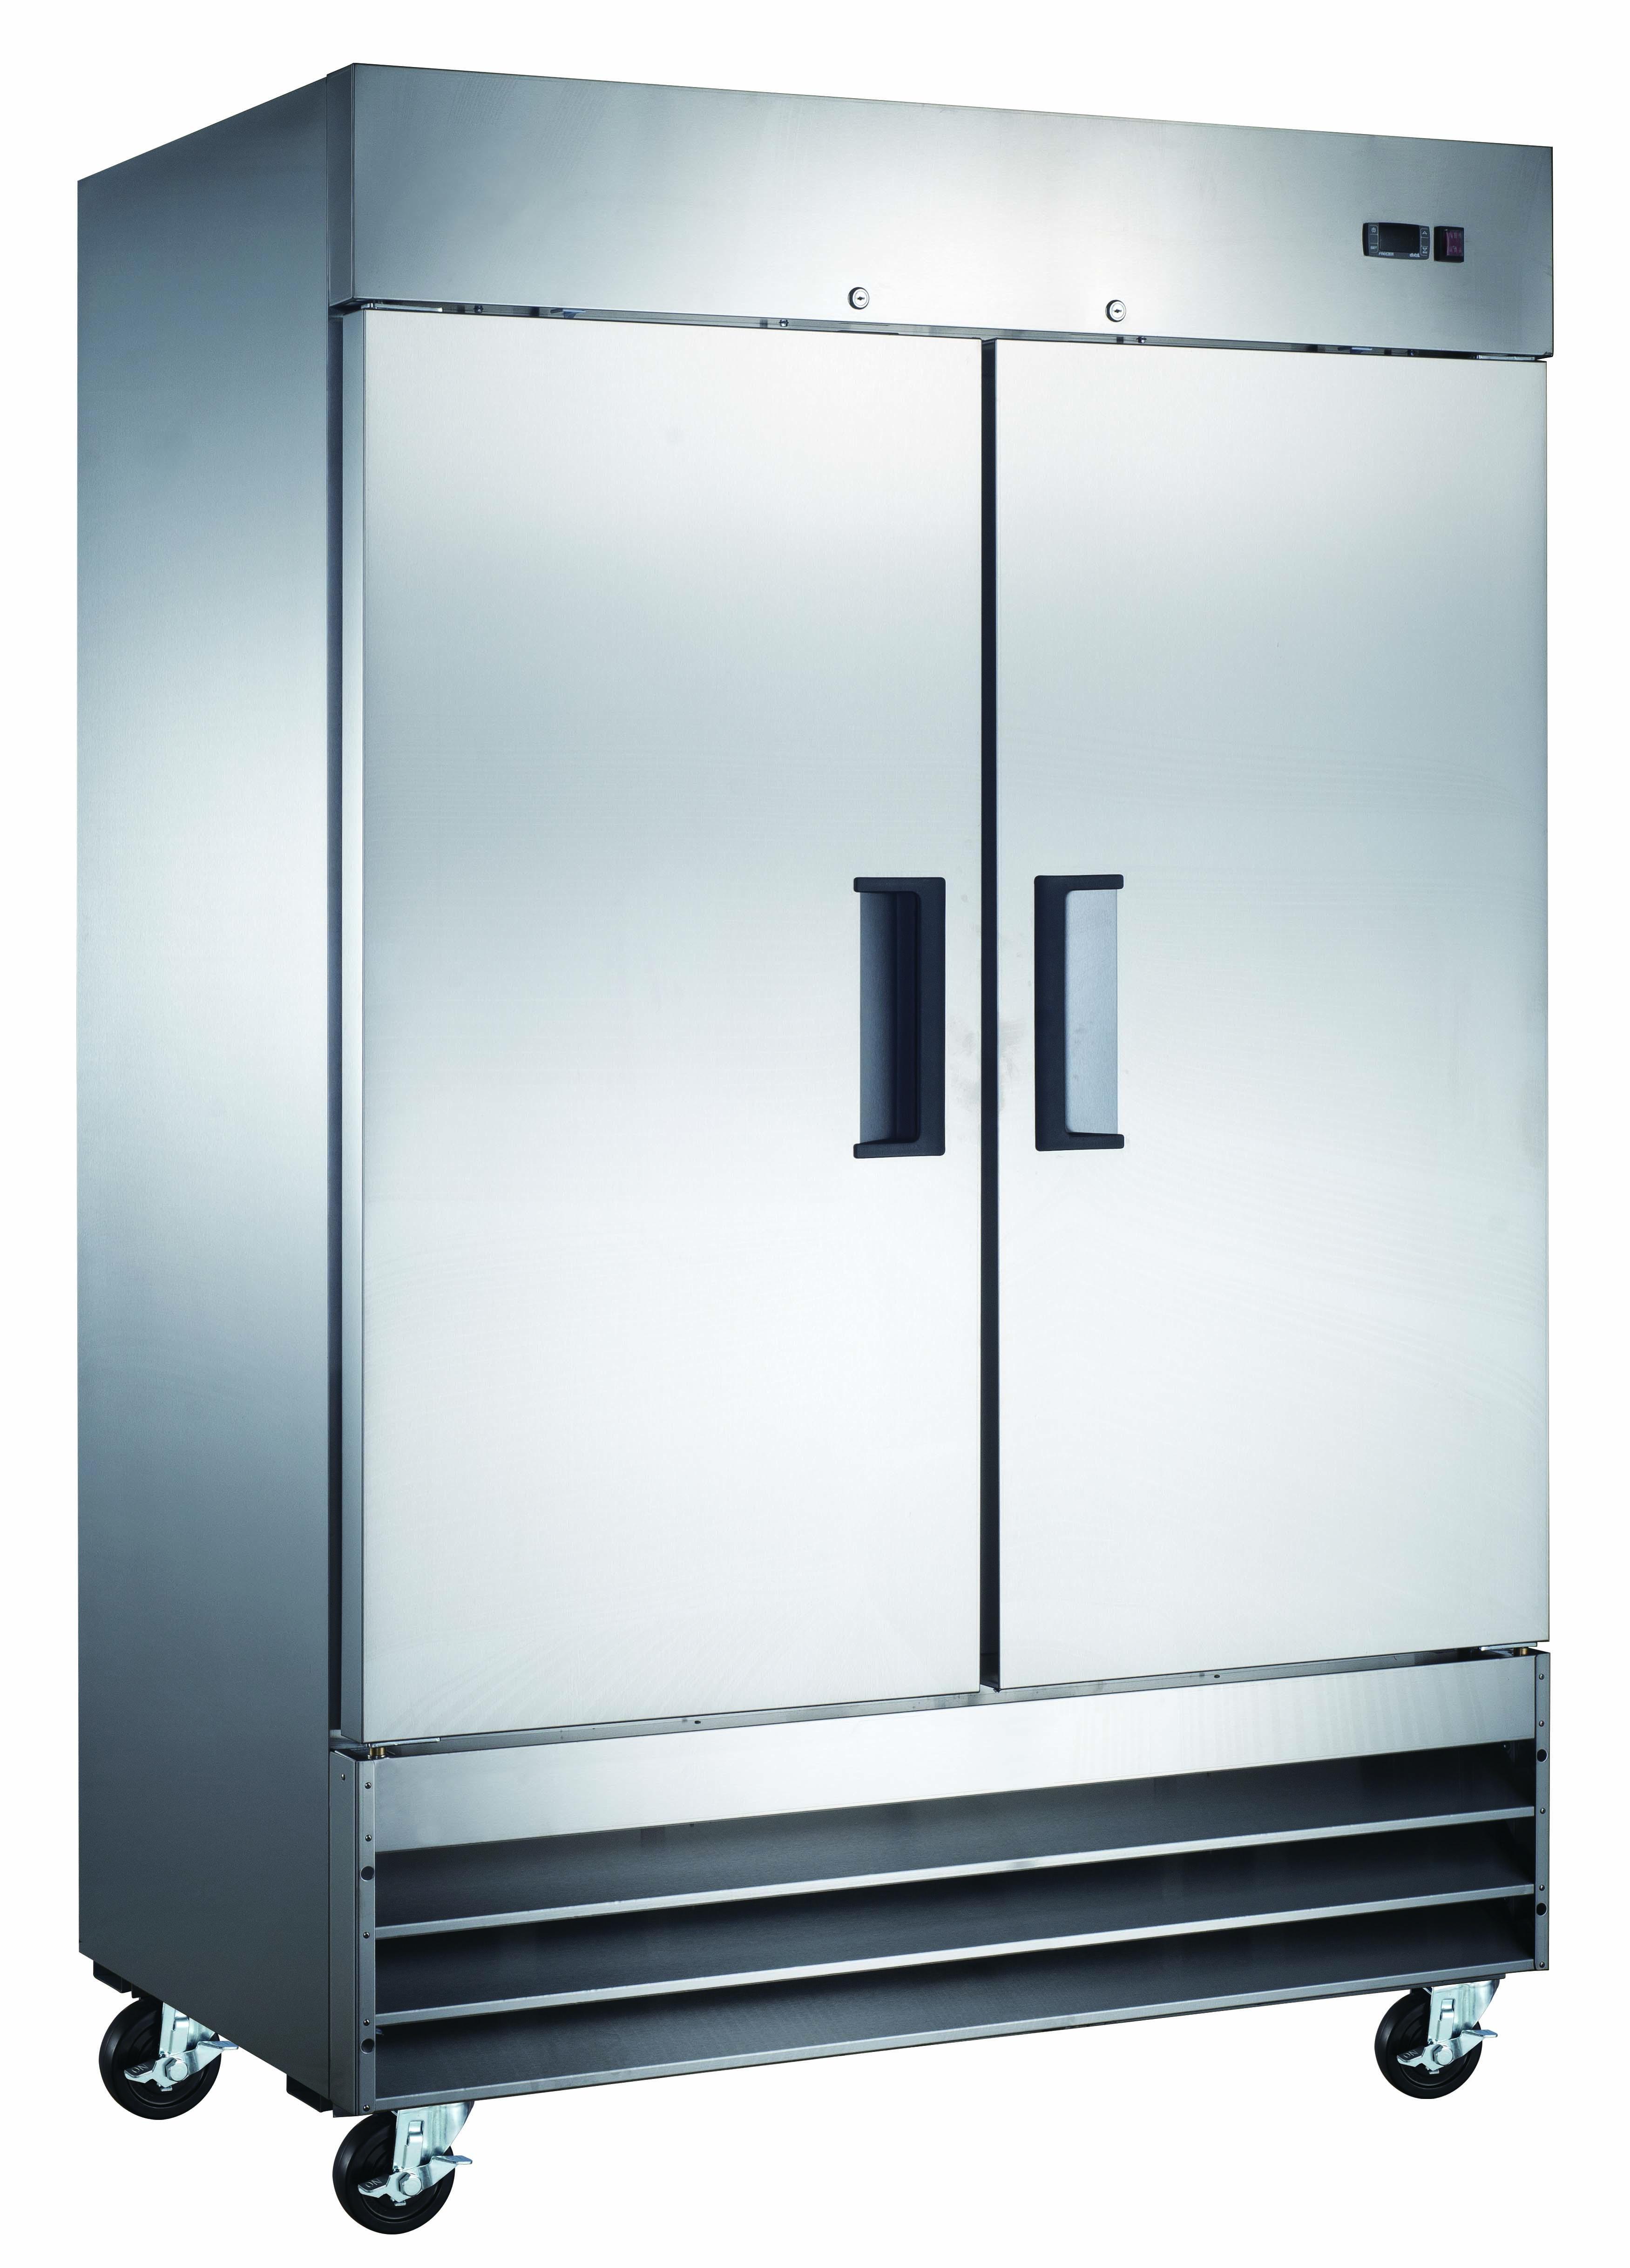 Admiral Craft USRF-2D-G refrigerator 2 door